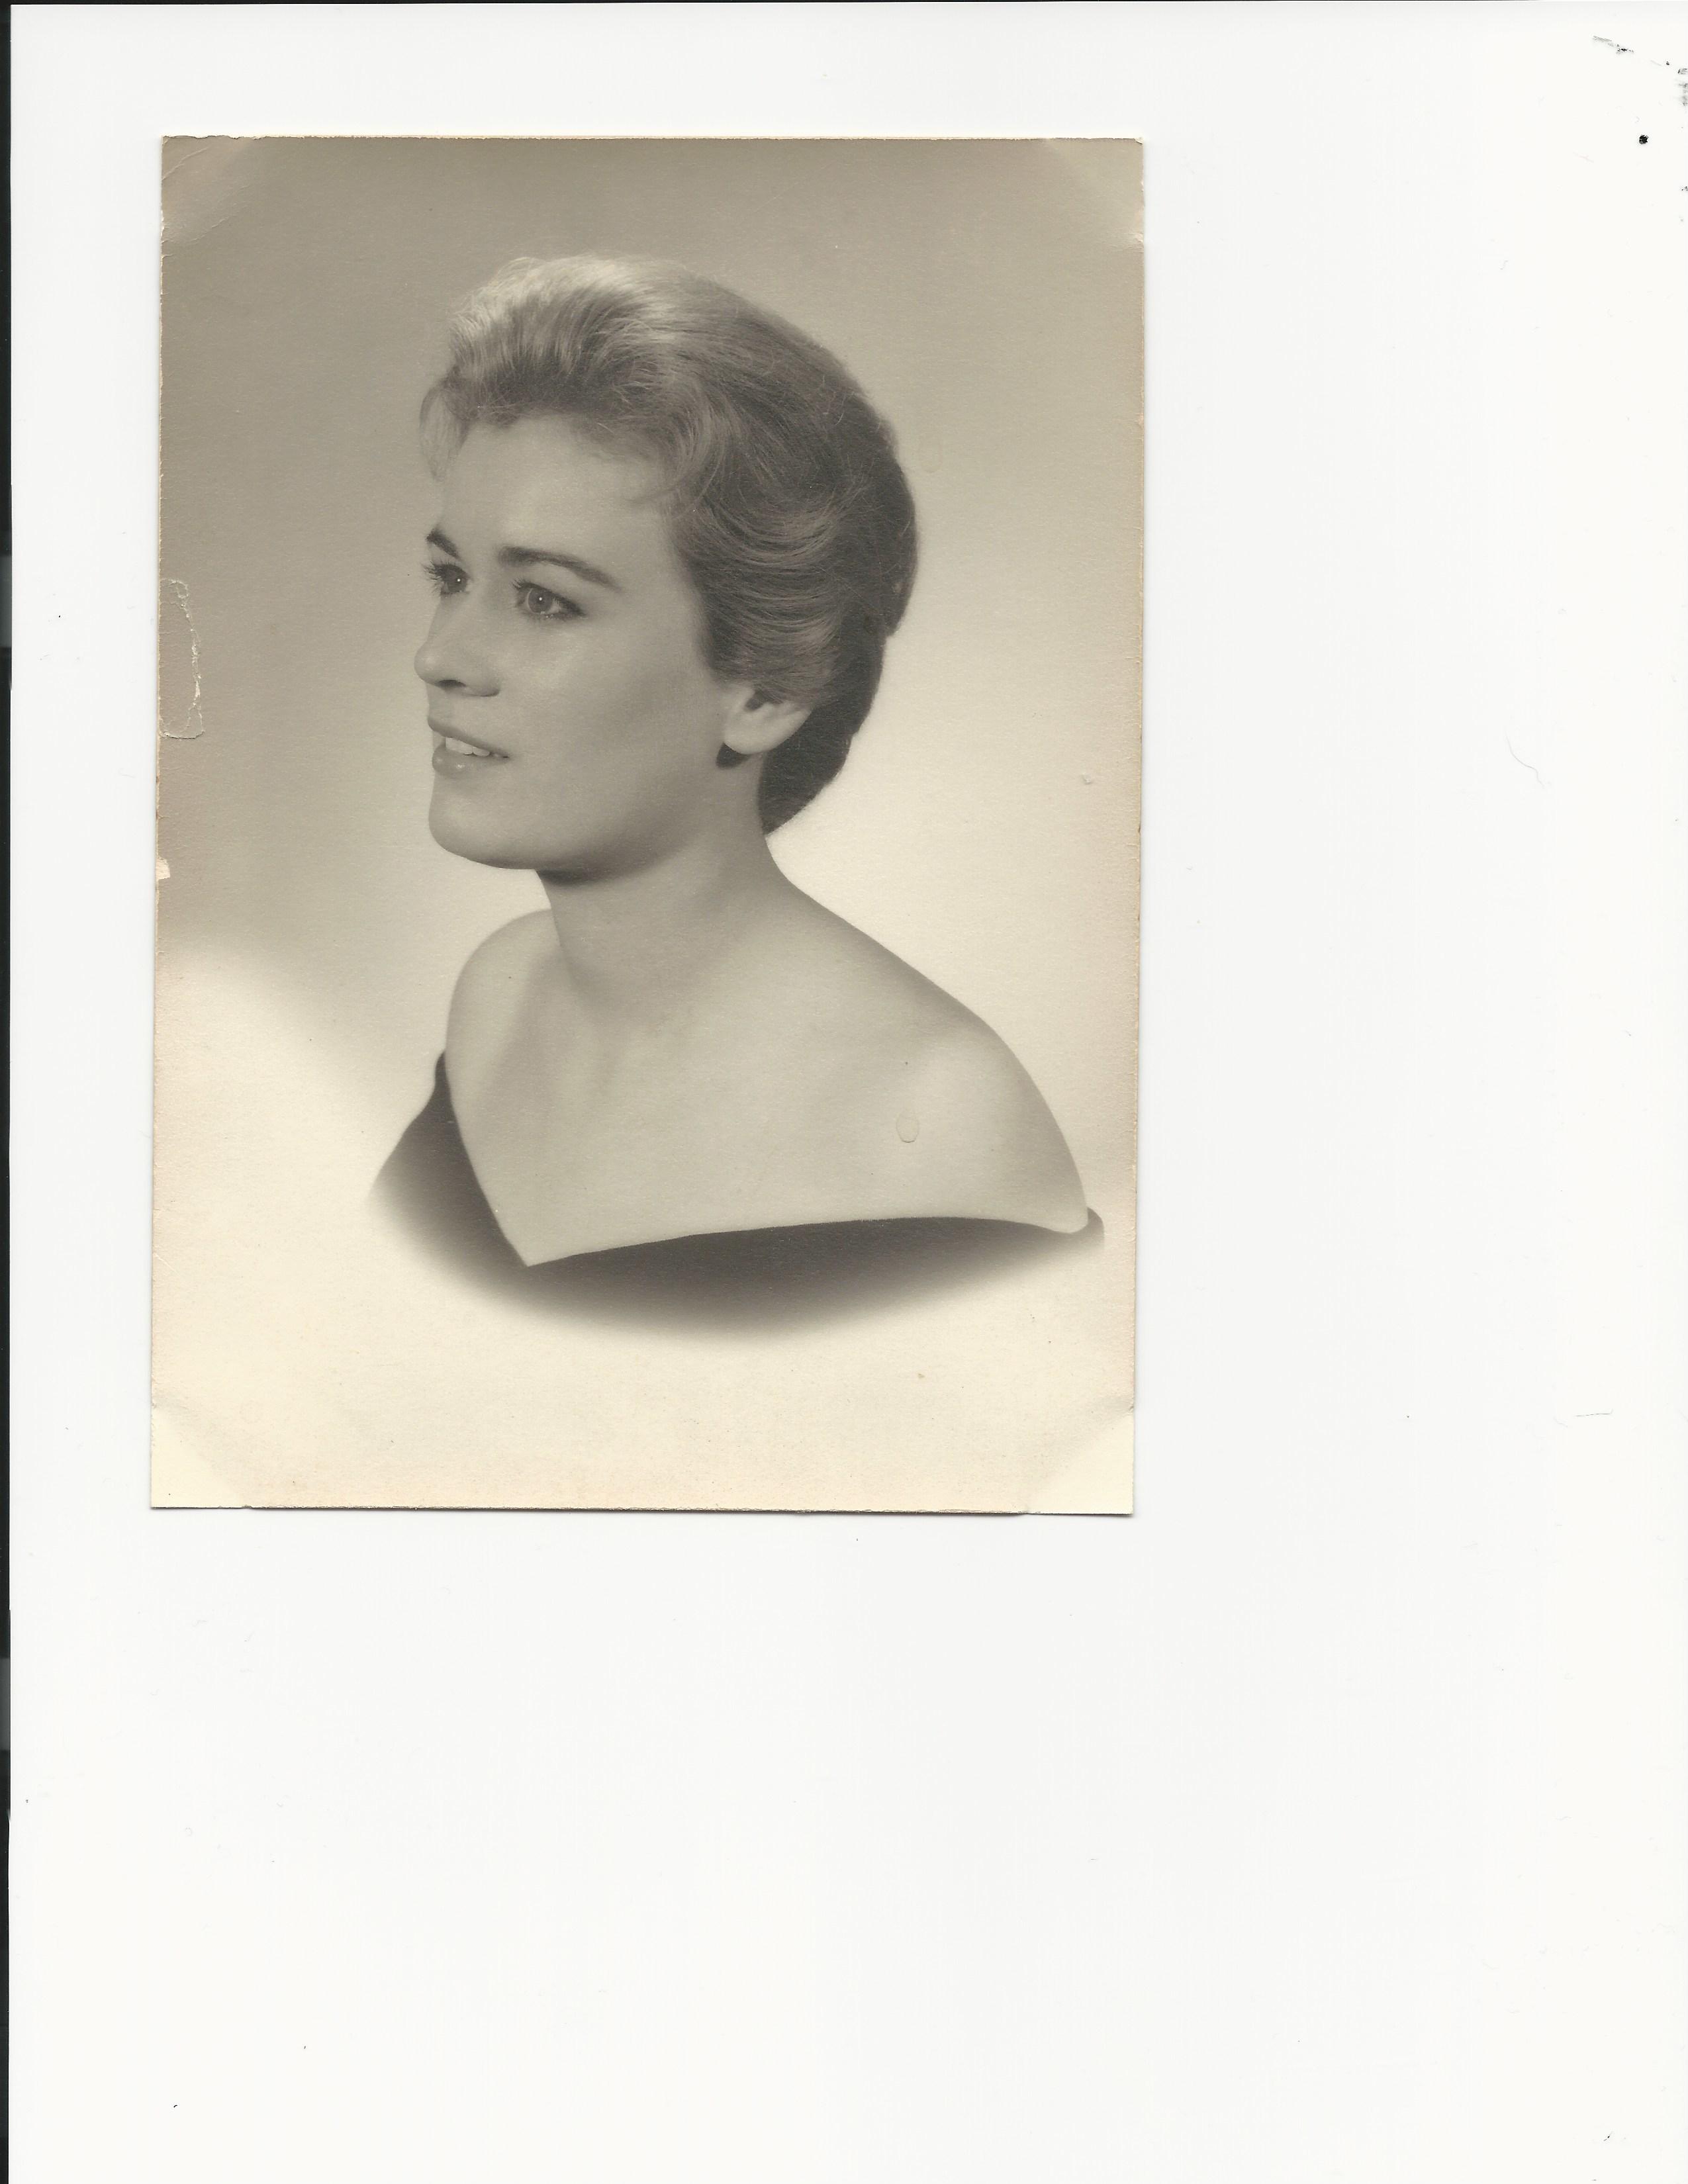 Louise Marie Gaver